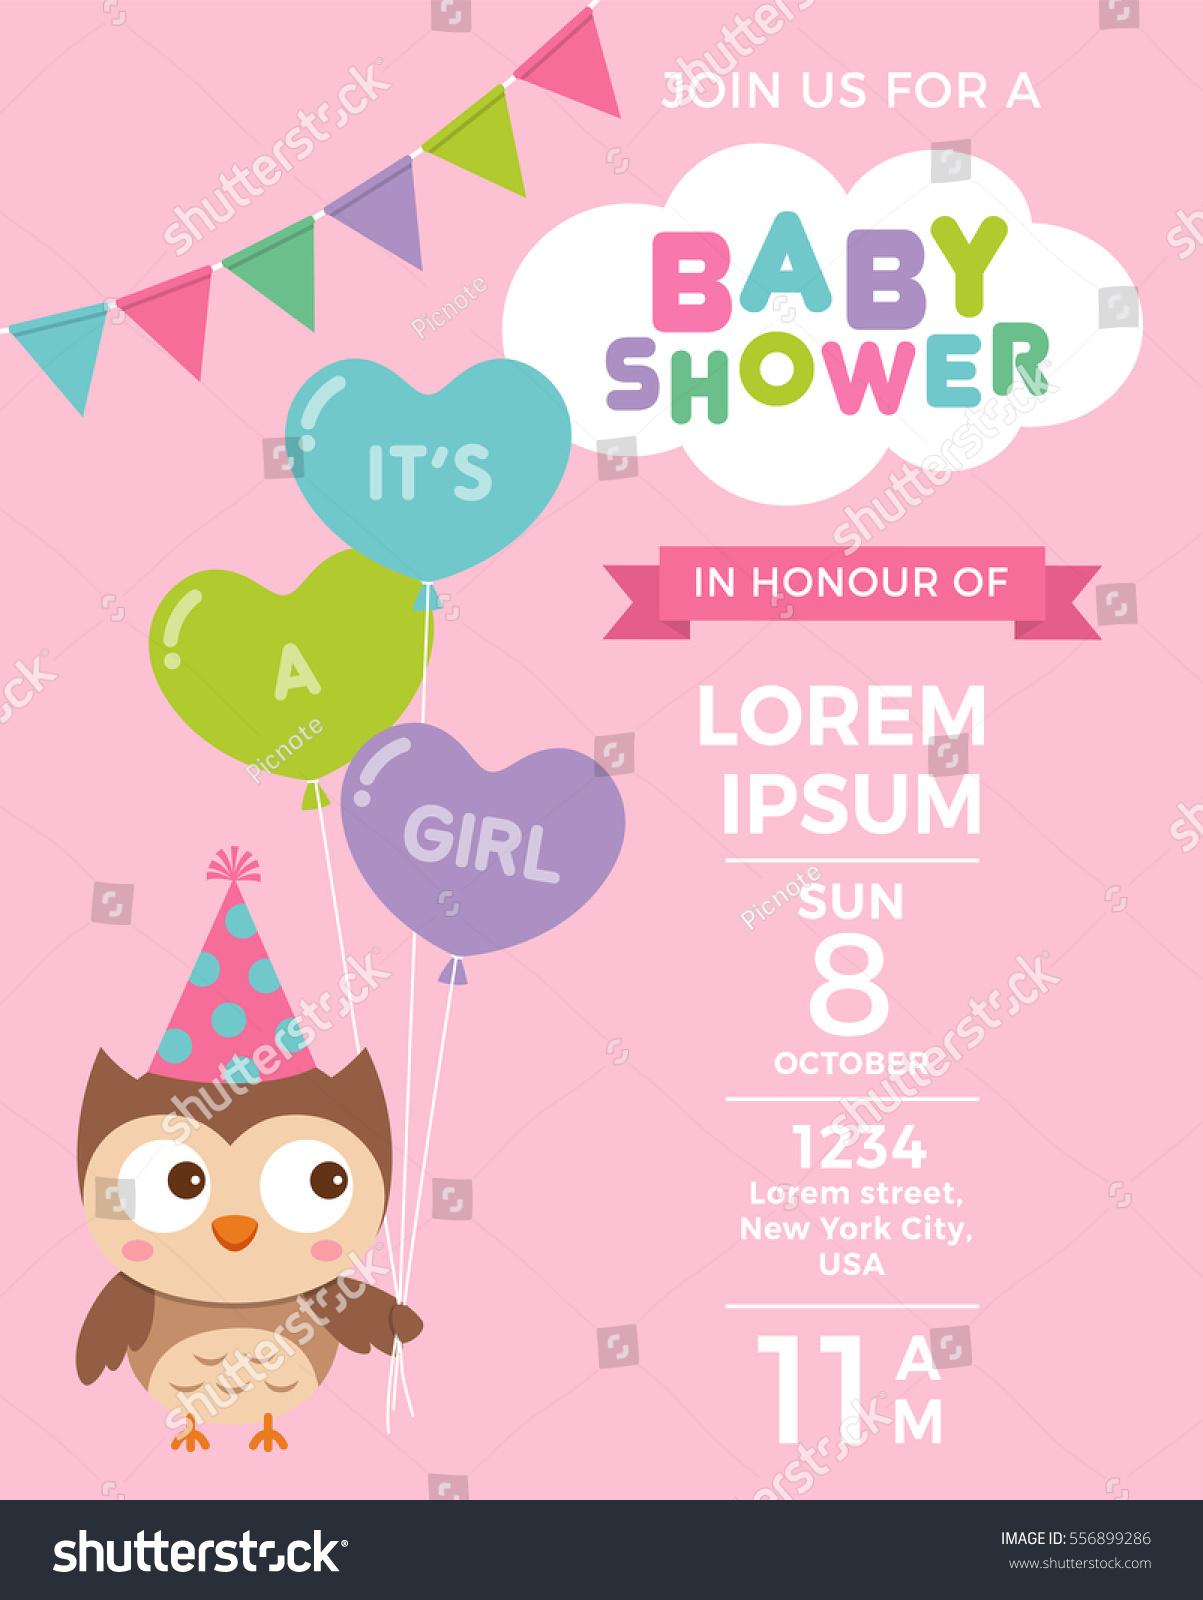 Cute Owl Balloons Baby Shower Invitation Stock Vector HD (Royalty ...